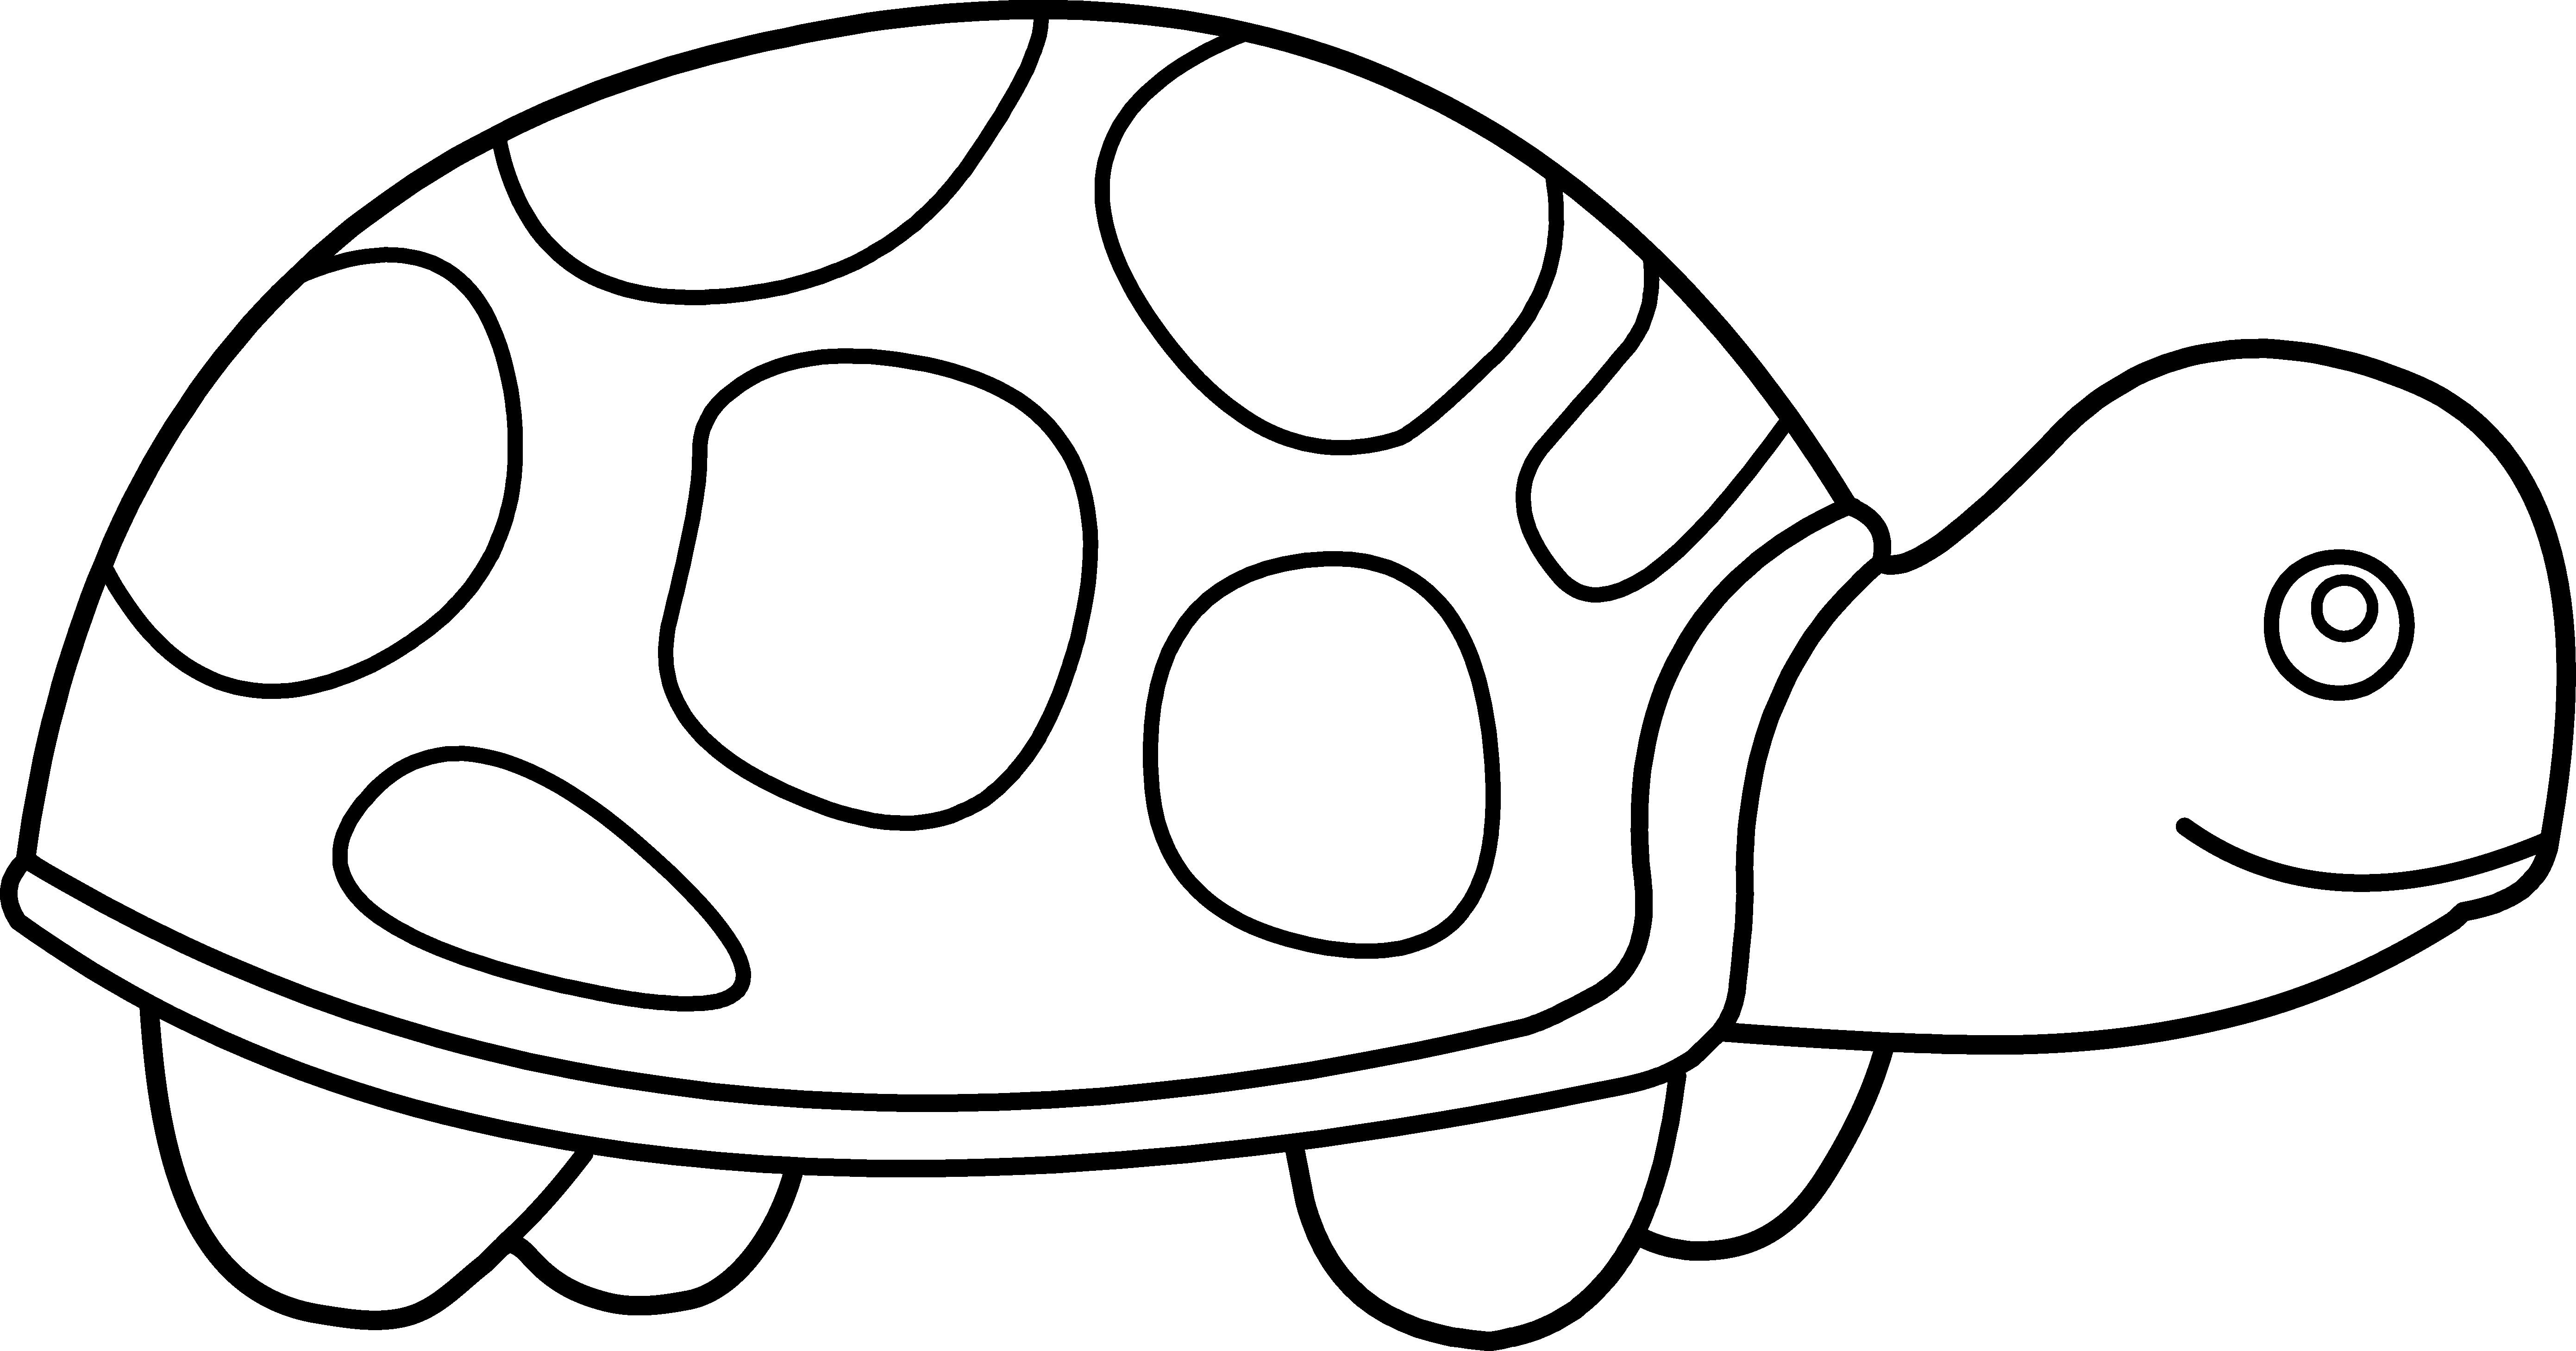 Line Art Turtle : Wagon clipart black and white panda free